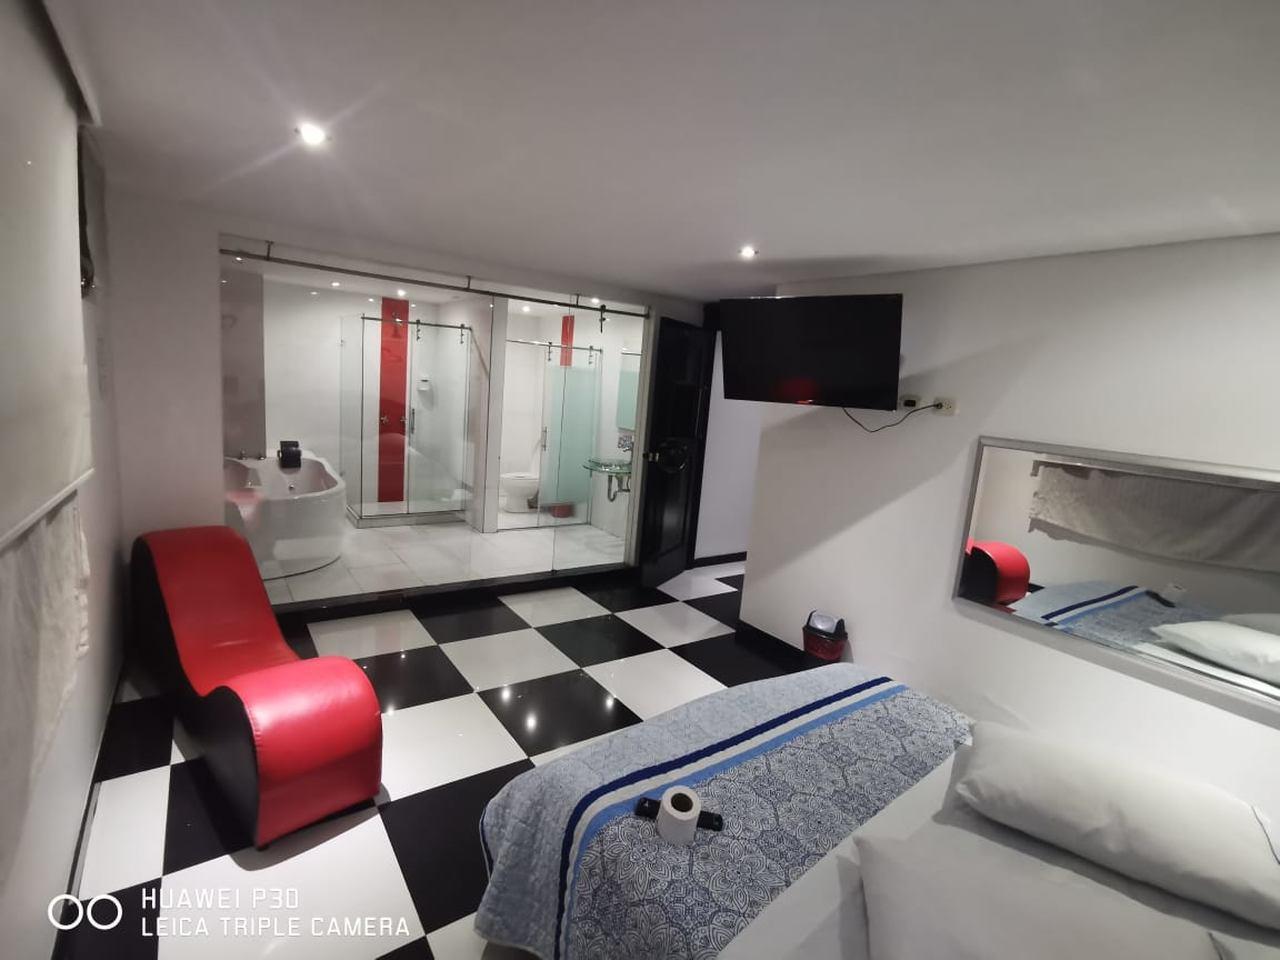 Confort real en Tunjuelito : MotelNow